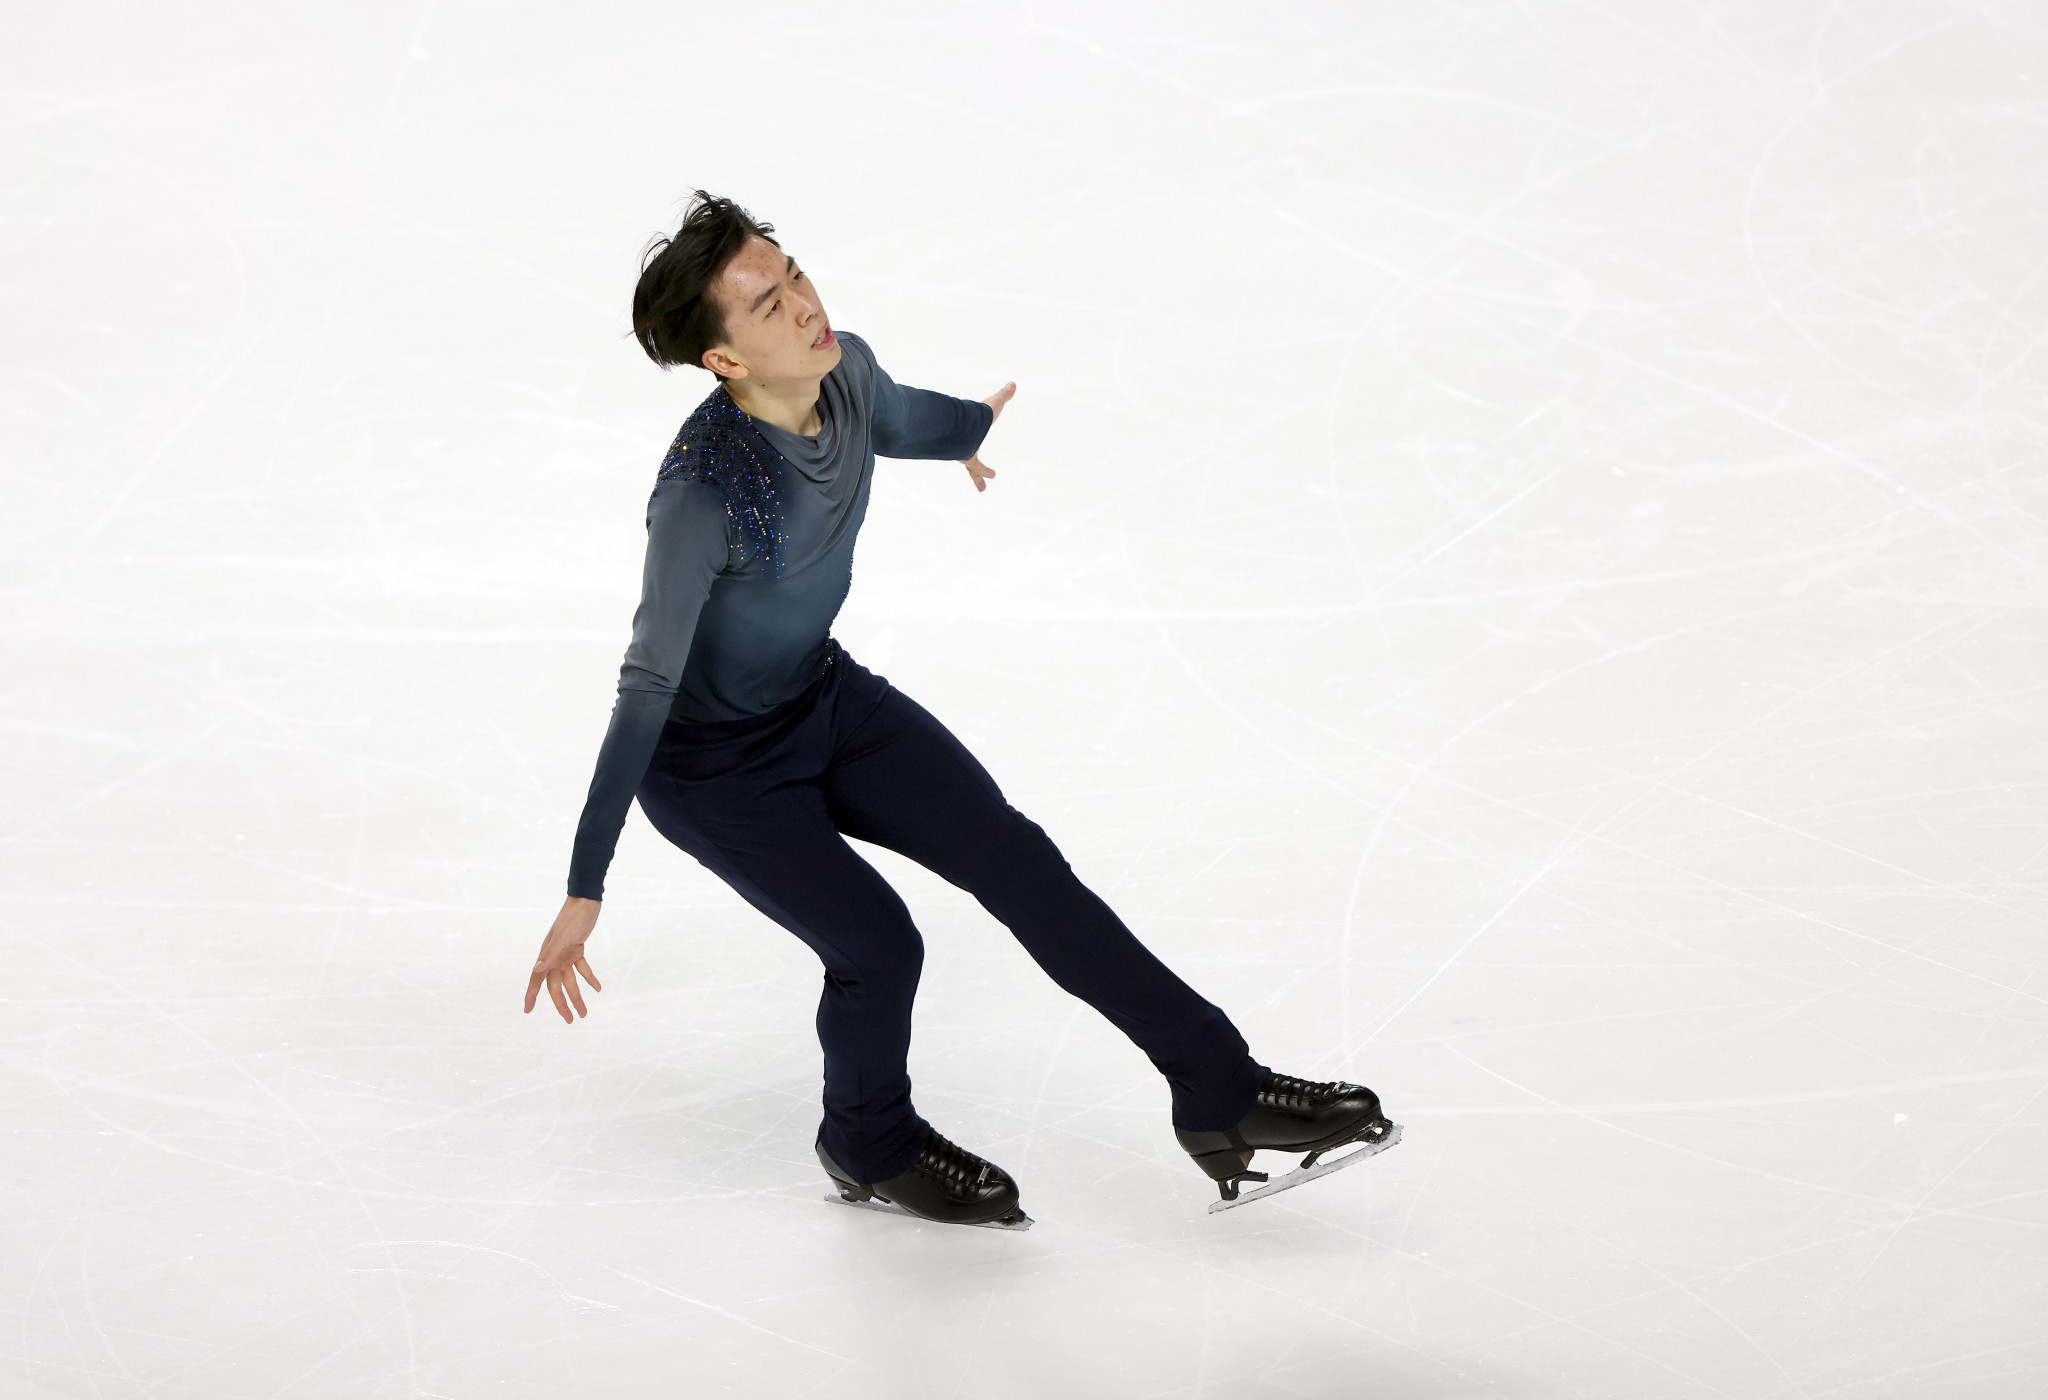 American figure skater Zhou targeting Beijing 2022 medal